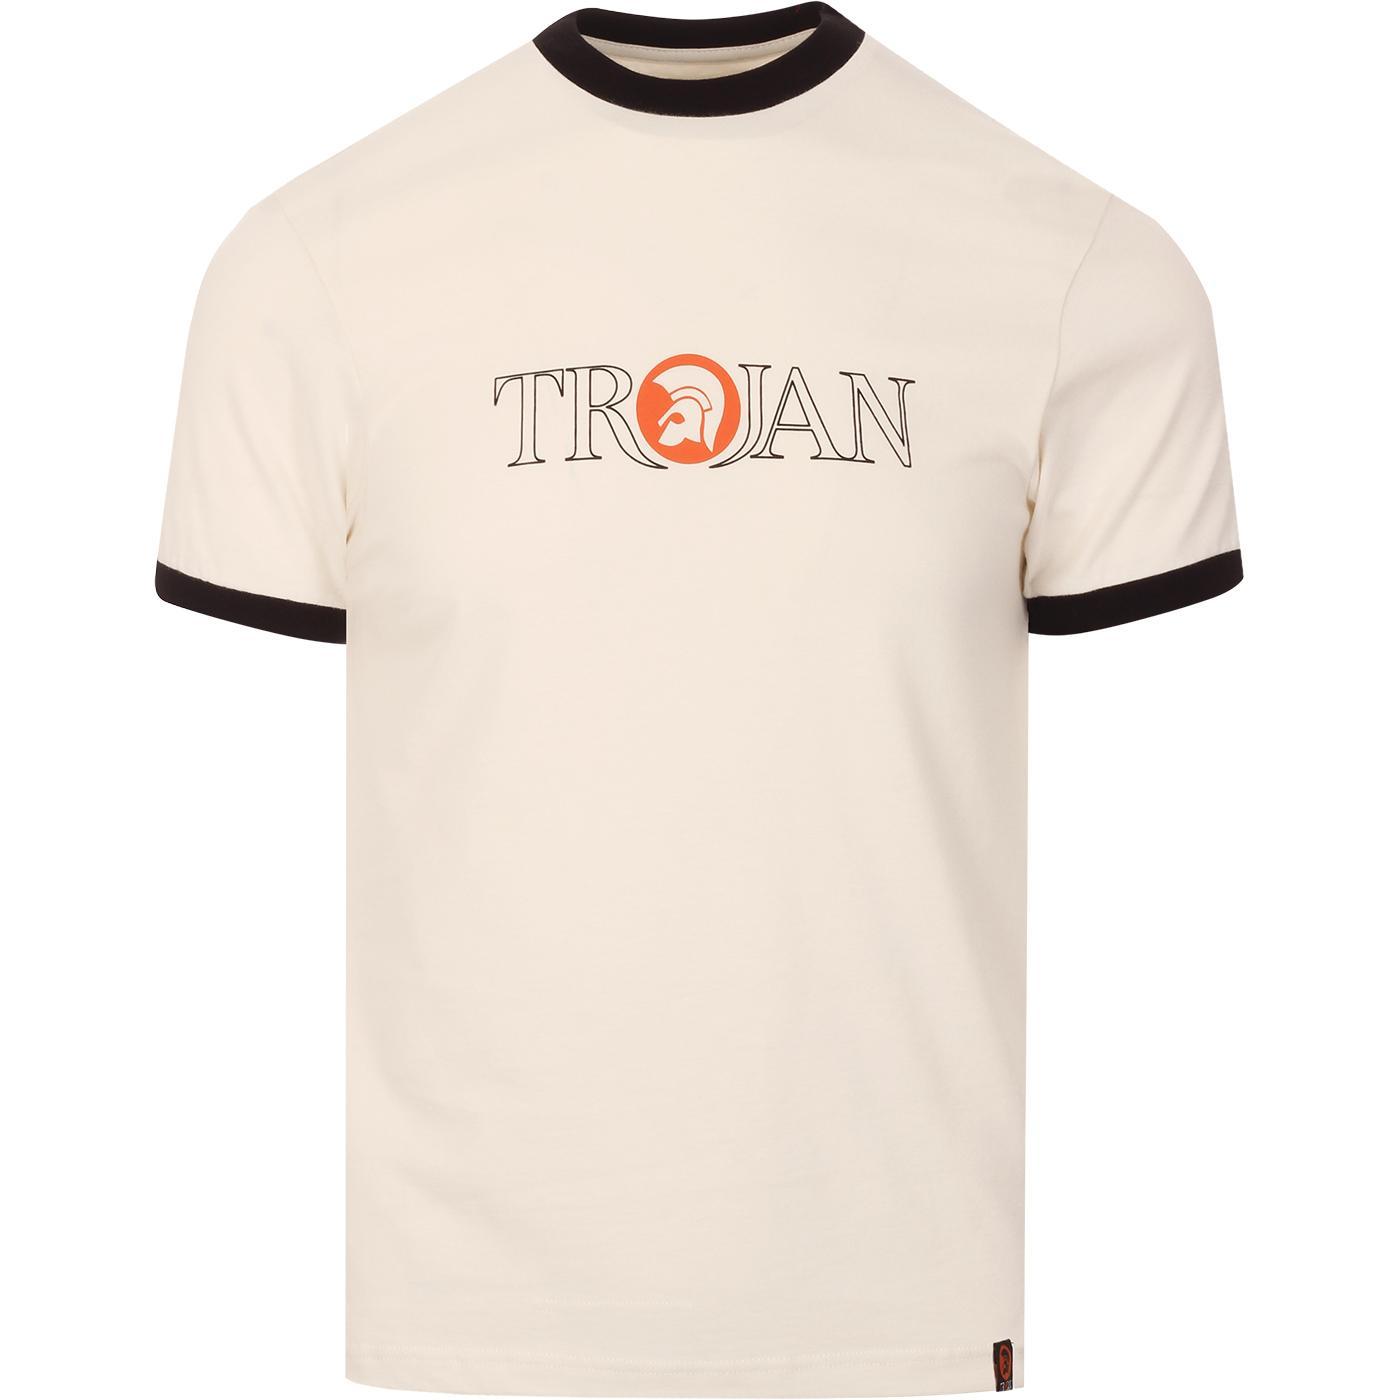 TROJAN RECORDS Retro Outline Logo Ringer T-Shirt E